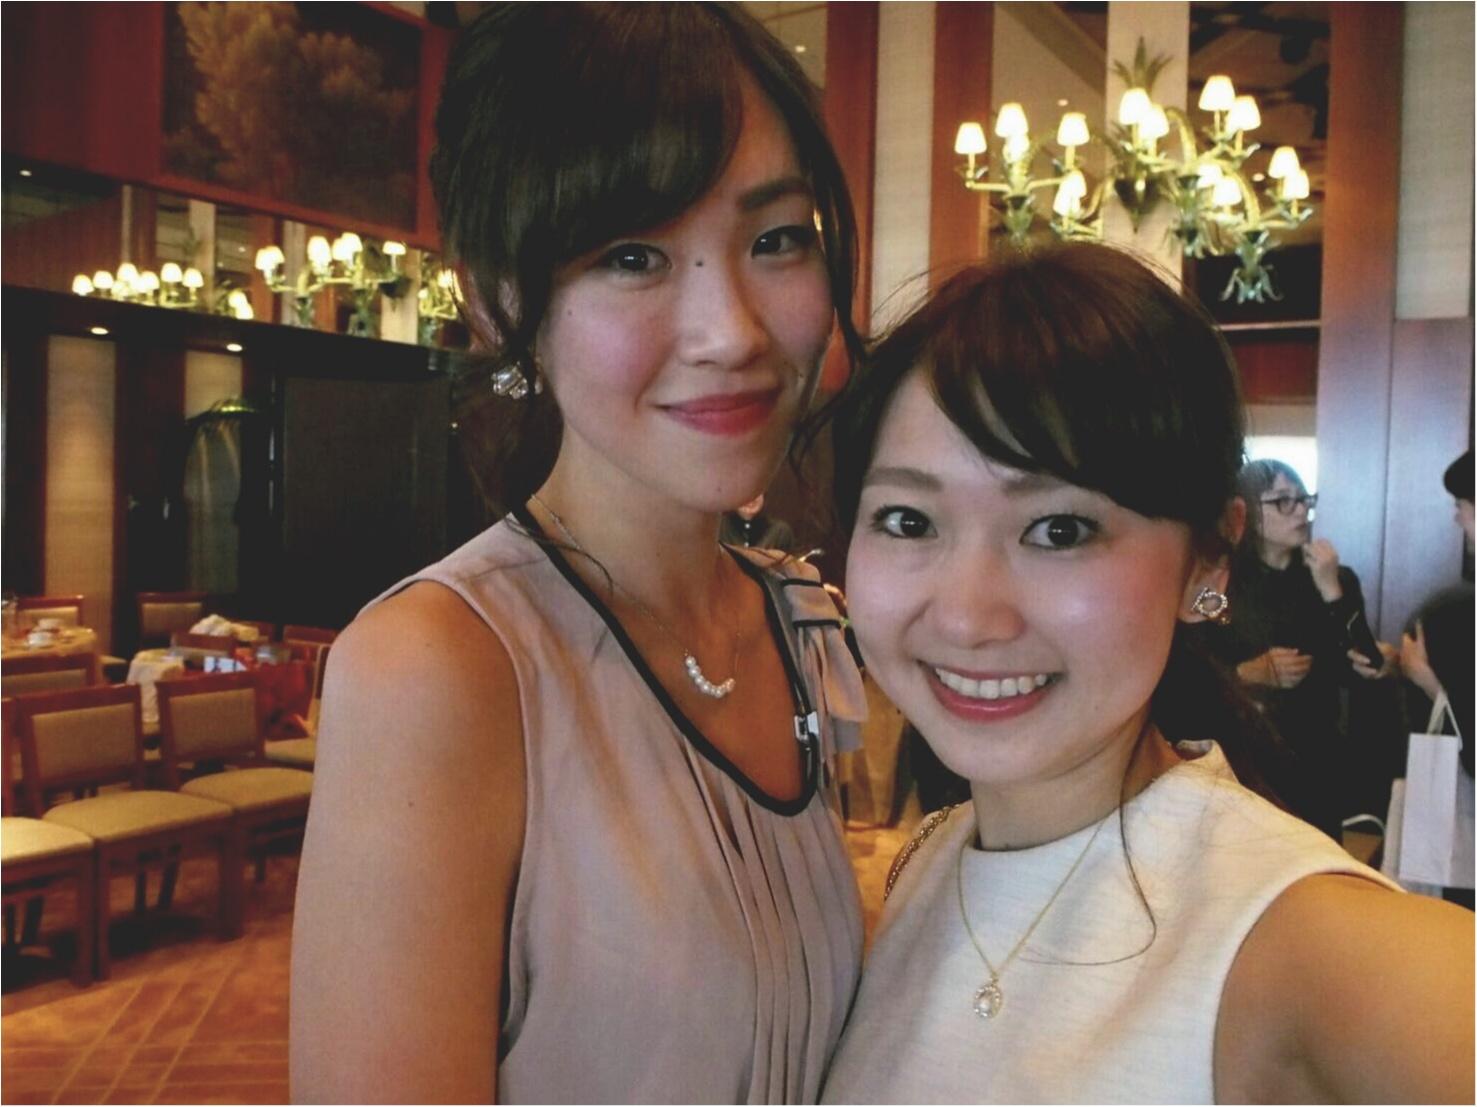 【♥︎♥︎♥︎】キラキラ女子が大集合!モアハピ部MORE大女子会2017♡_5